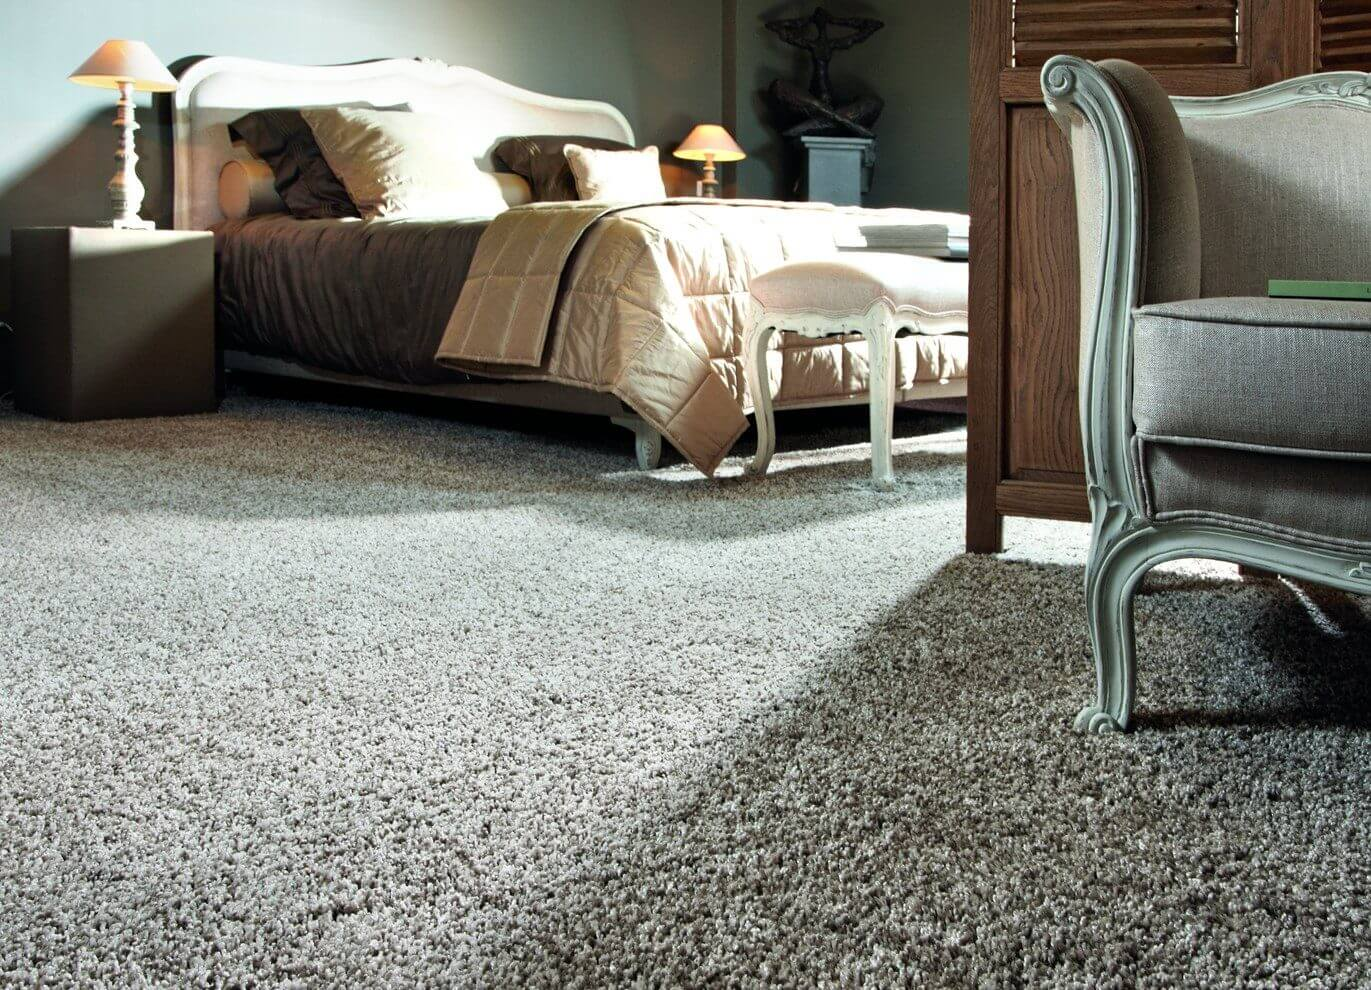 Bedroom Carpet | Modern Carpet at Cheap Price in Doha